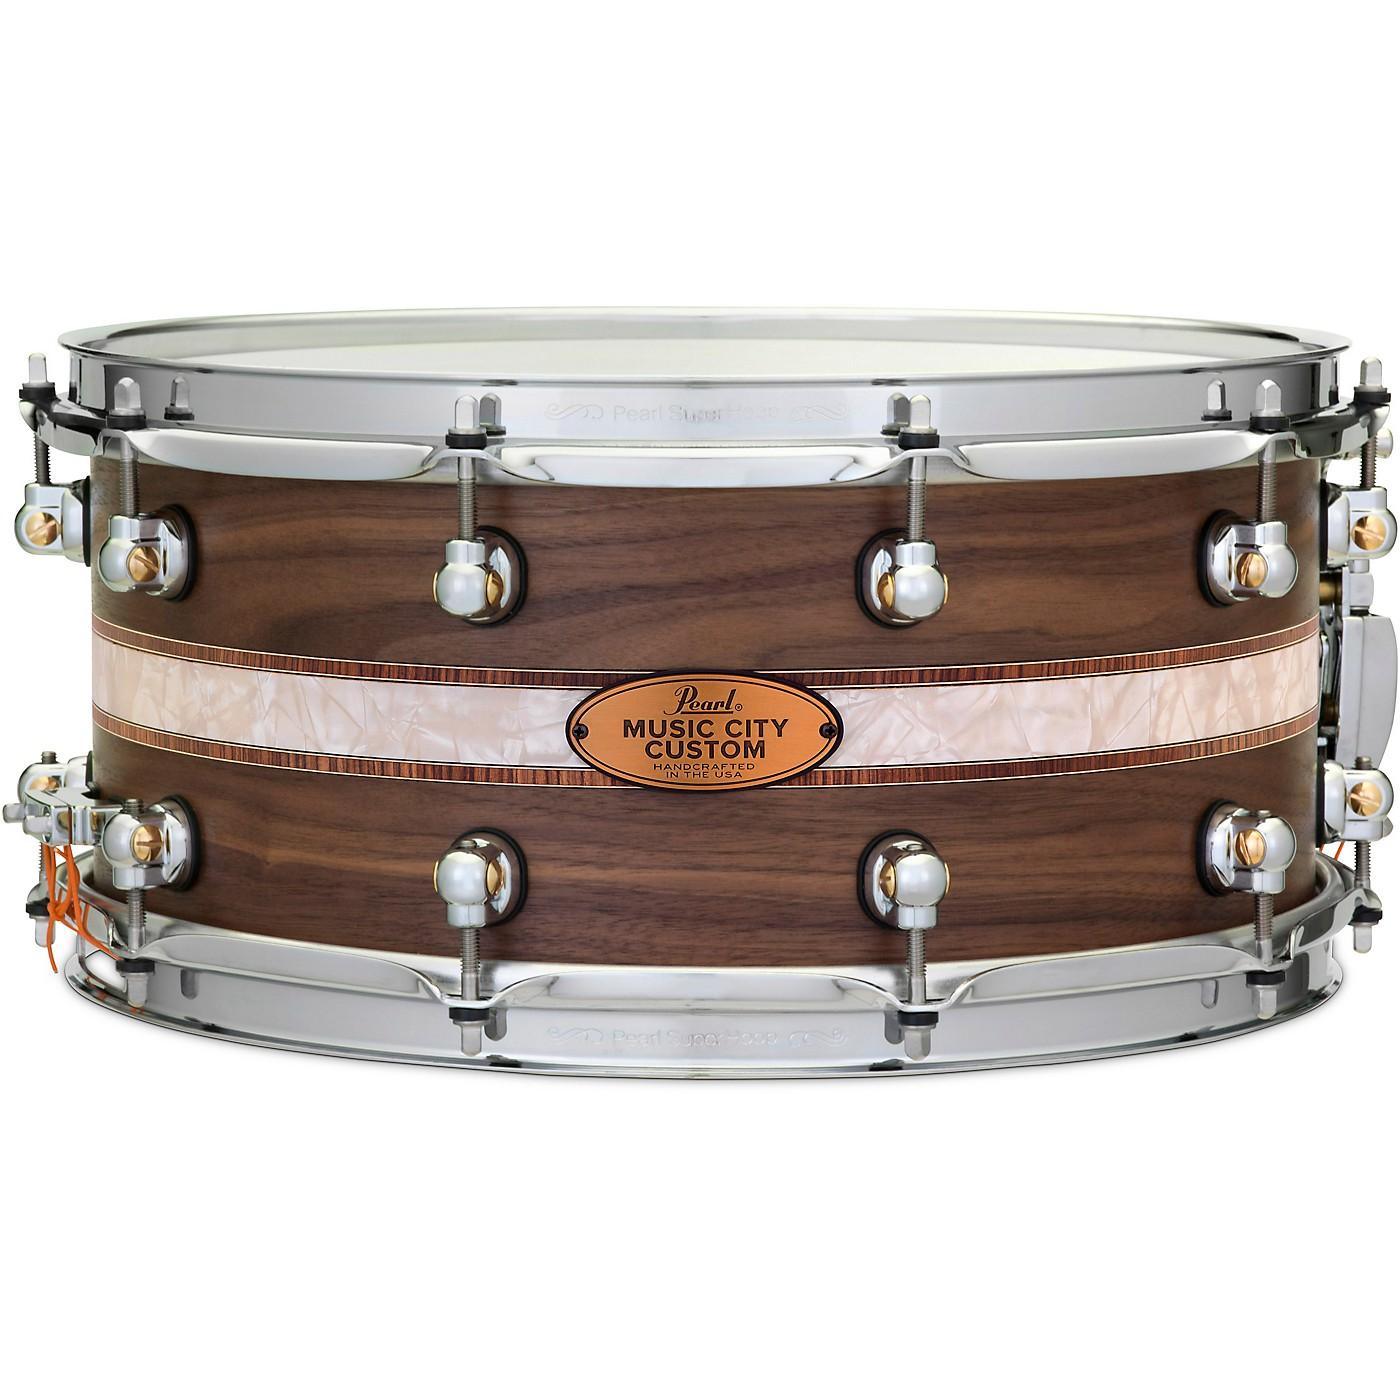 Pearl Music City Custom Solid Shell Snare Walnut with Kingwood Royal Inlay thumbnail